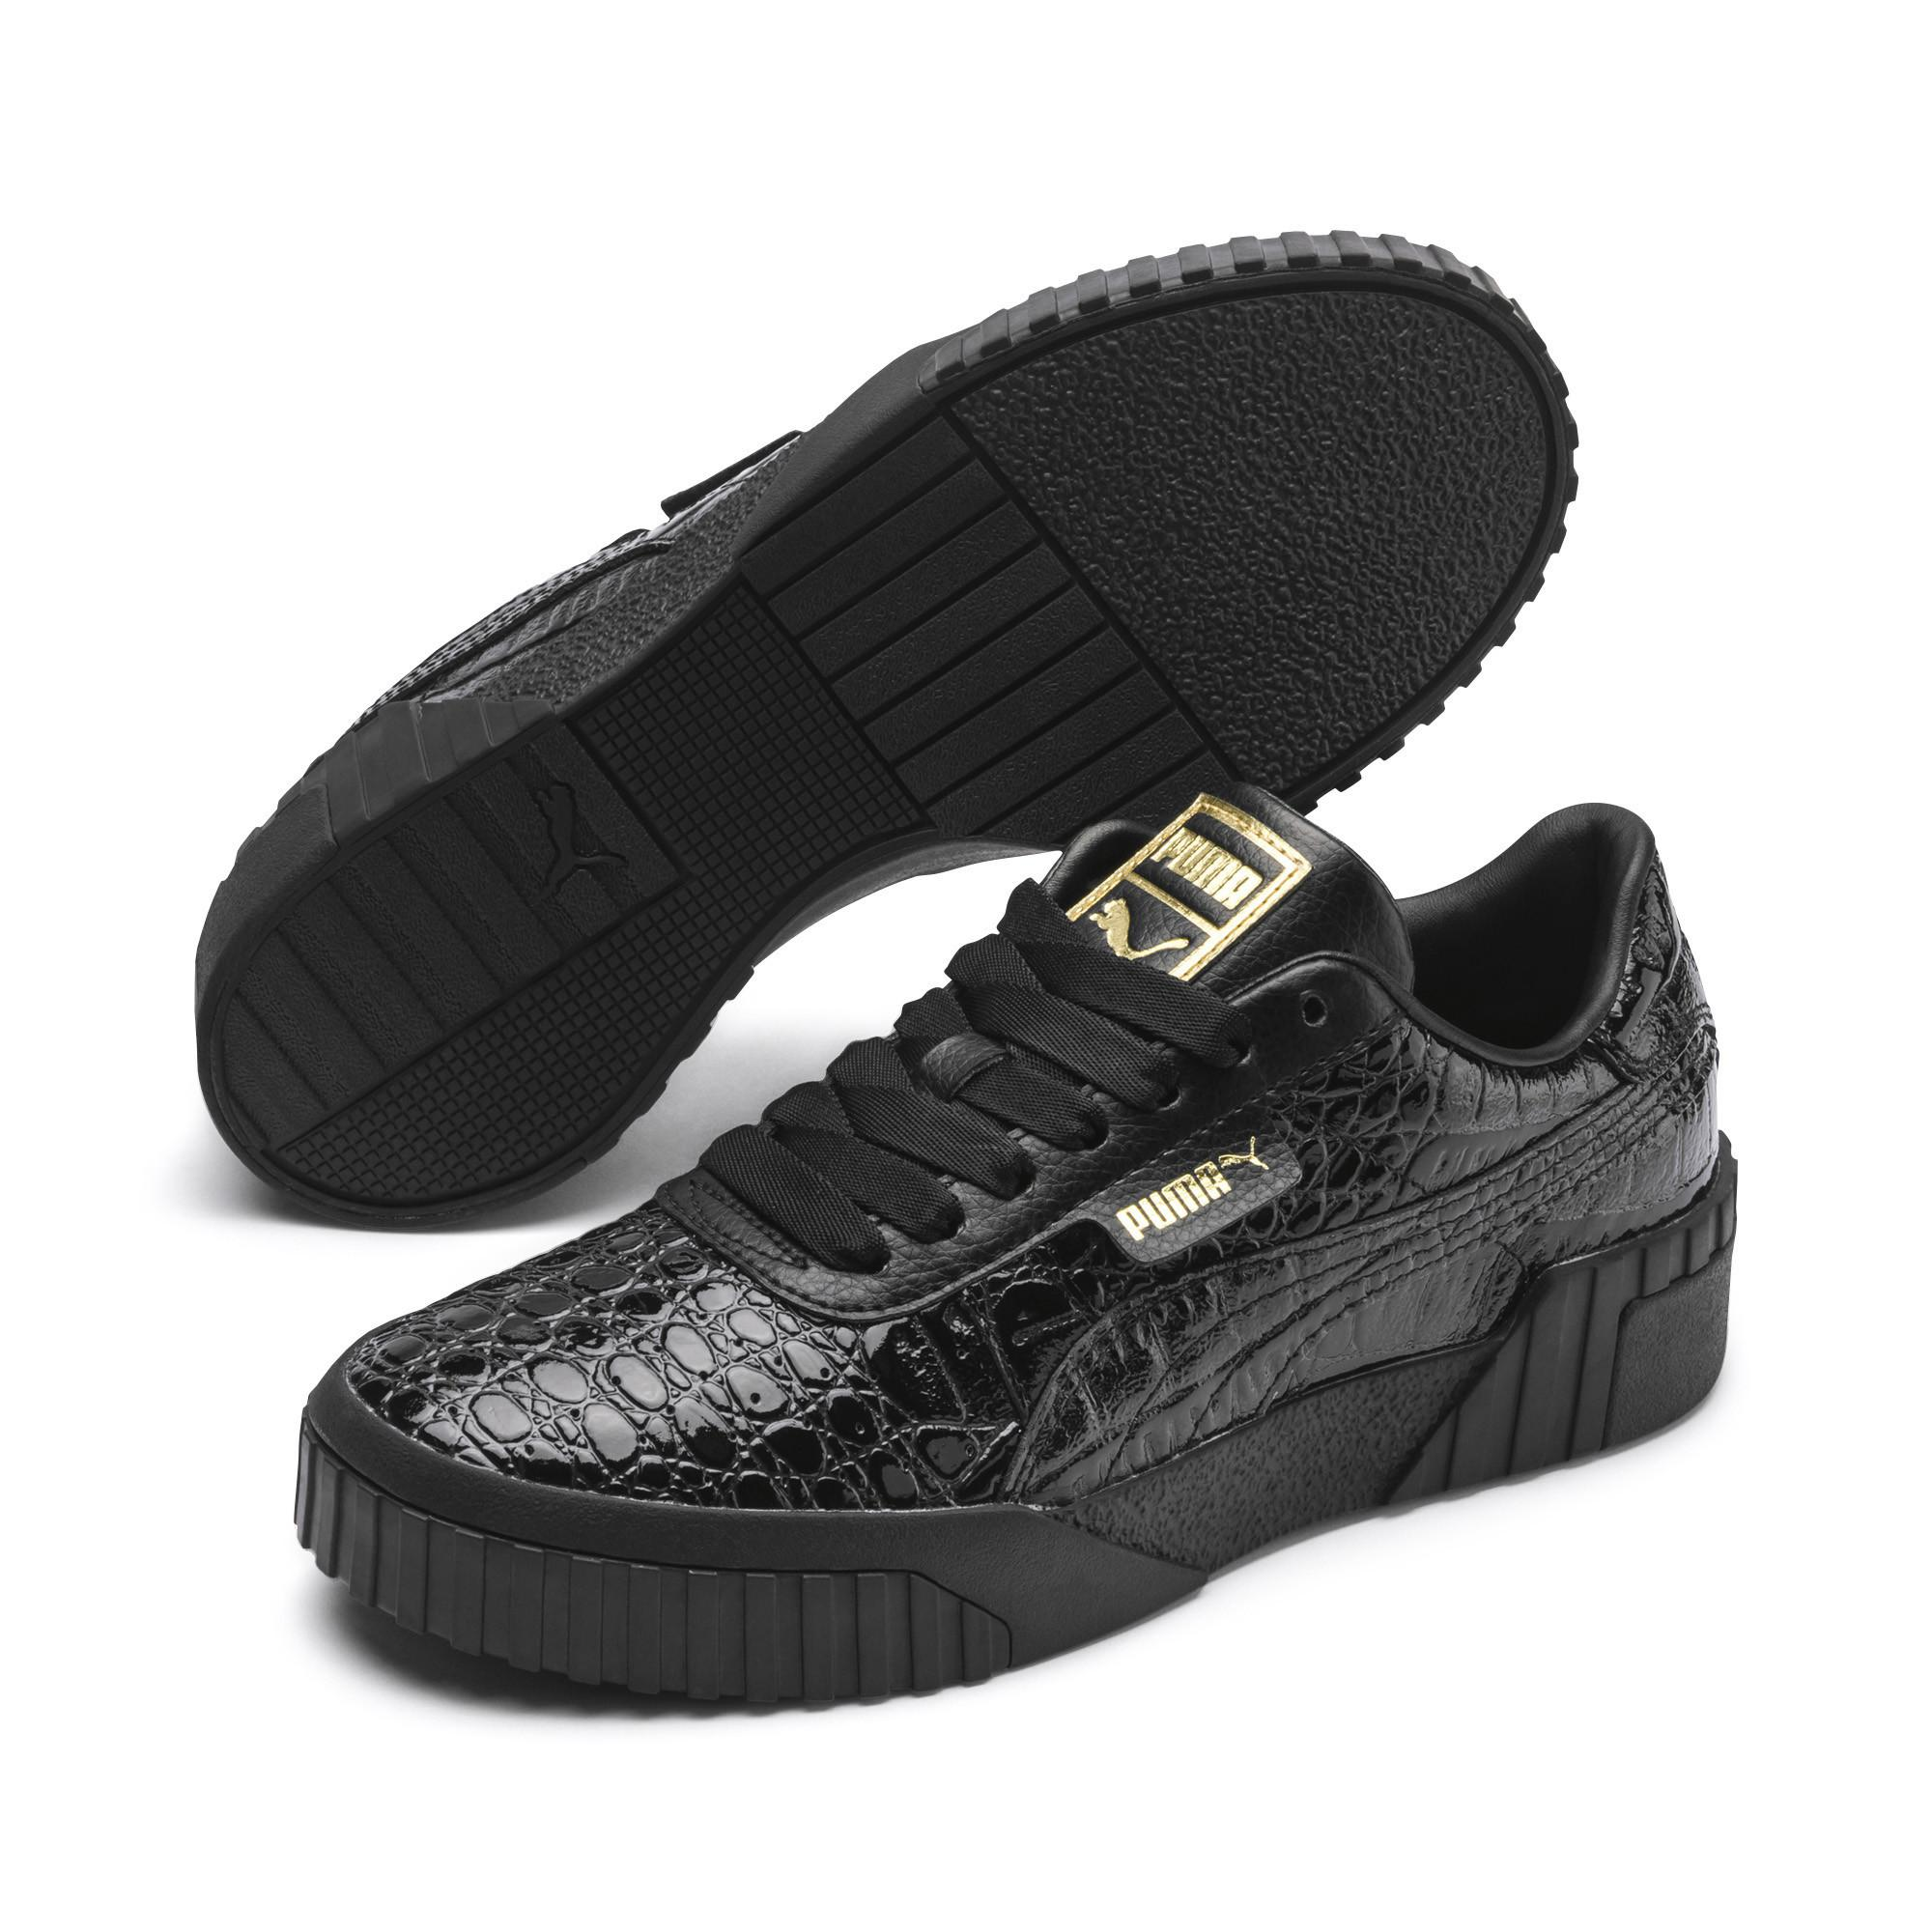 134657338b4 Lyst - PUMA Cali Croc Women s Sneakers in Black